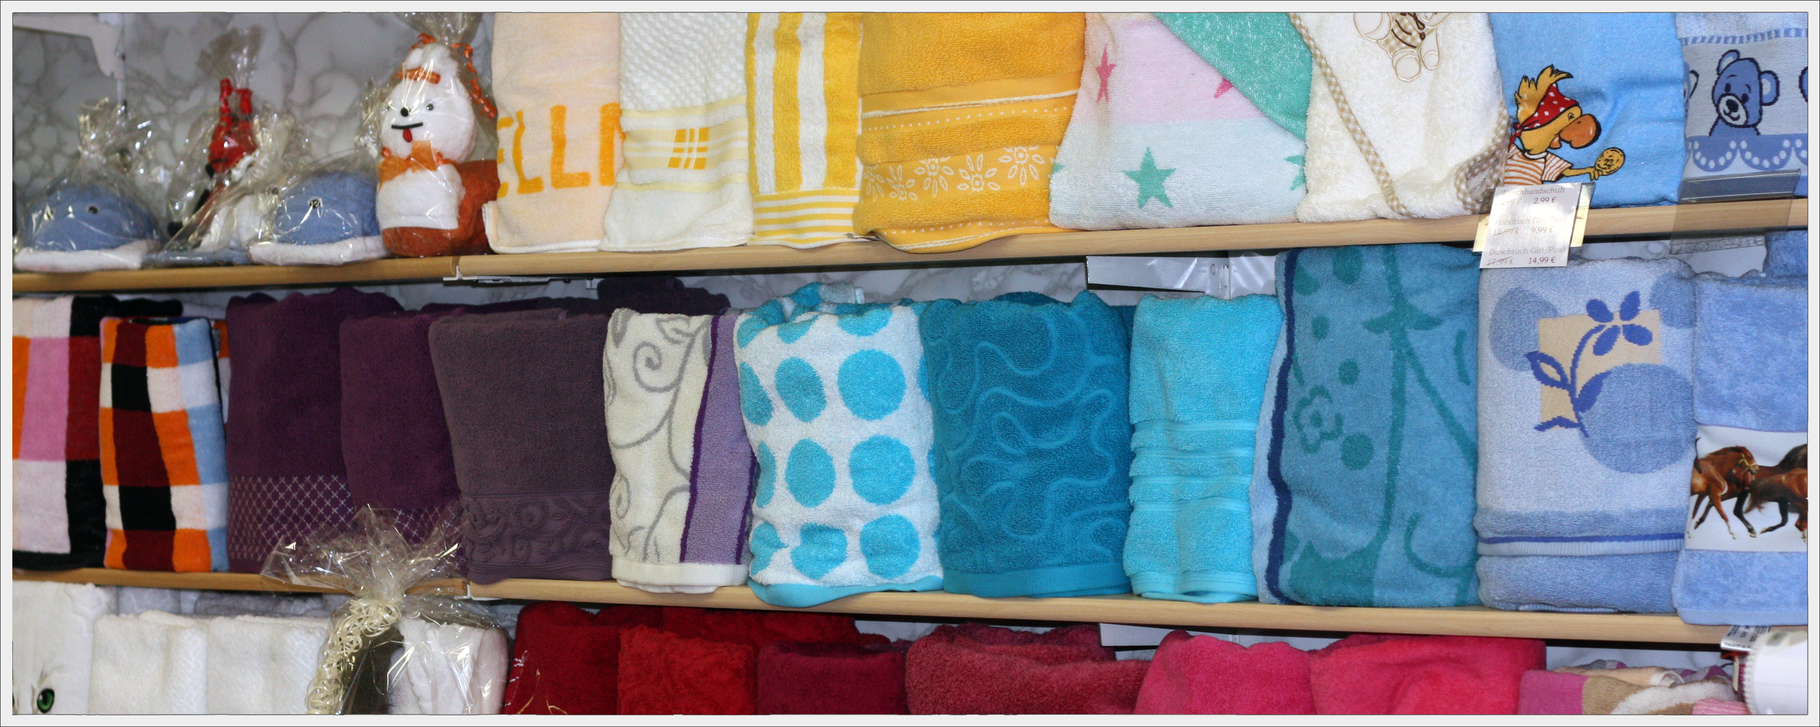 Handtücher der Fa. Herka